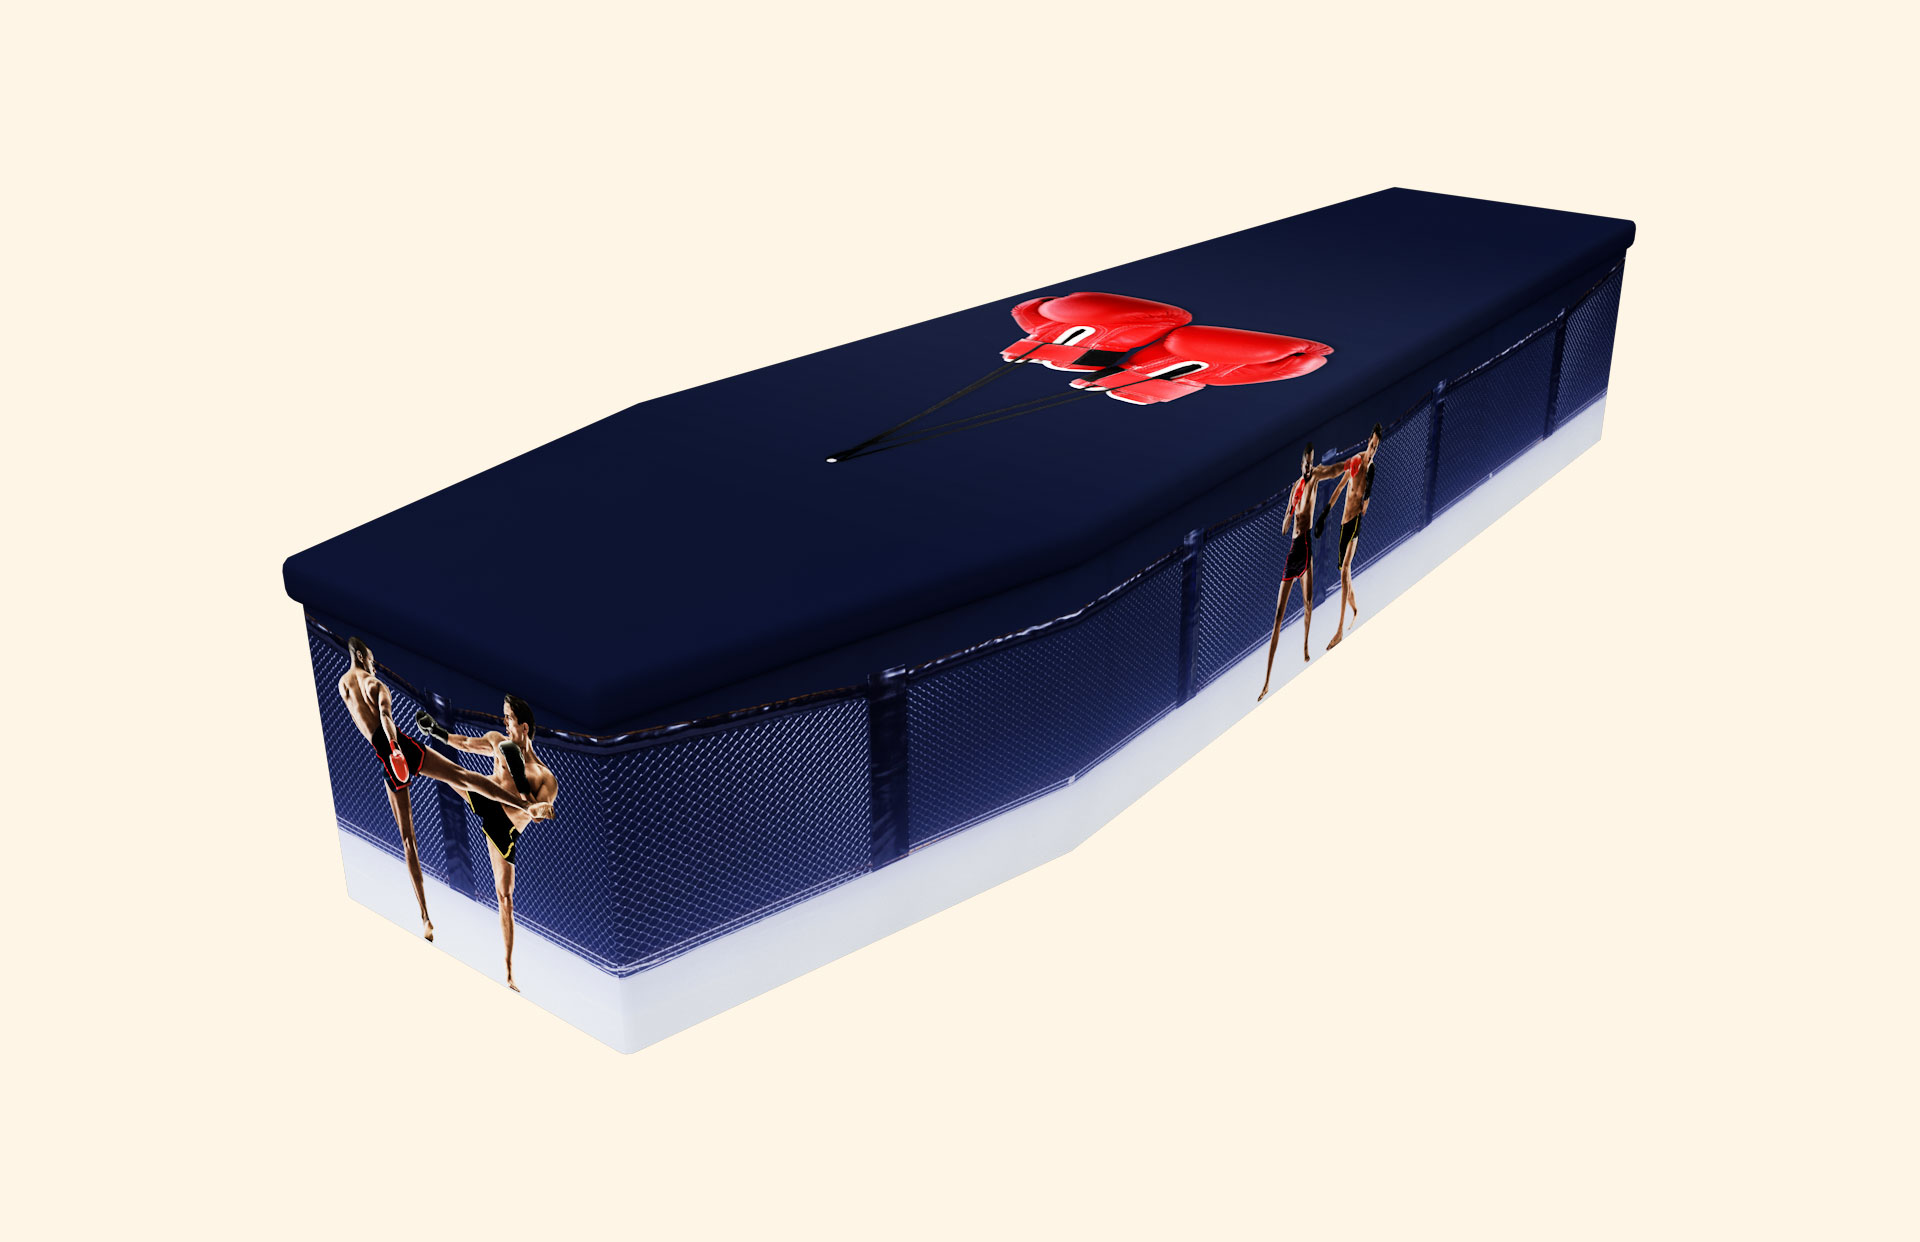 Ultimate Fighting Cardboard coffin